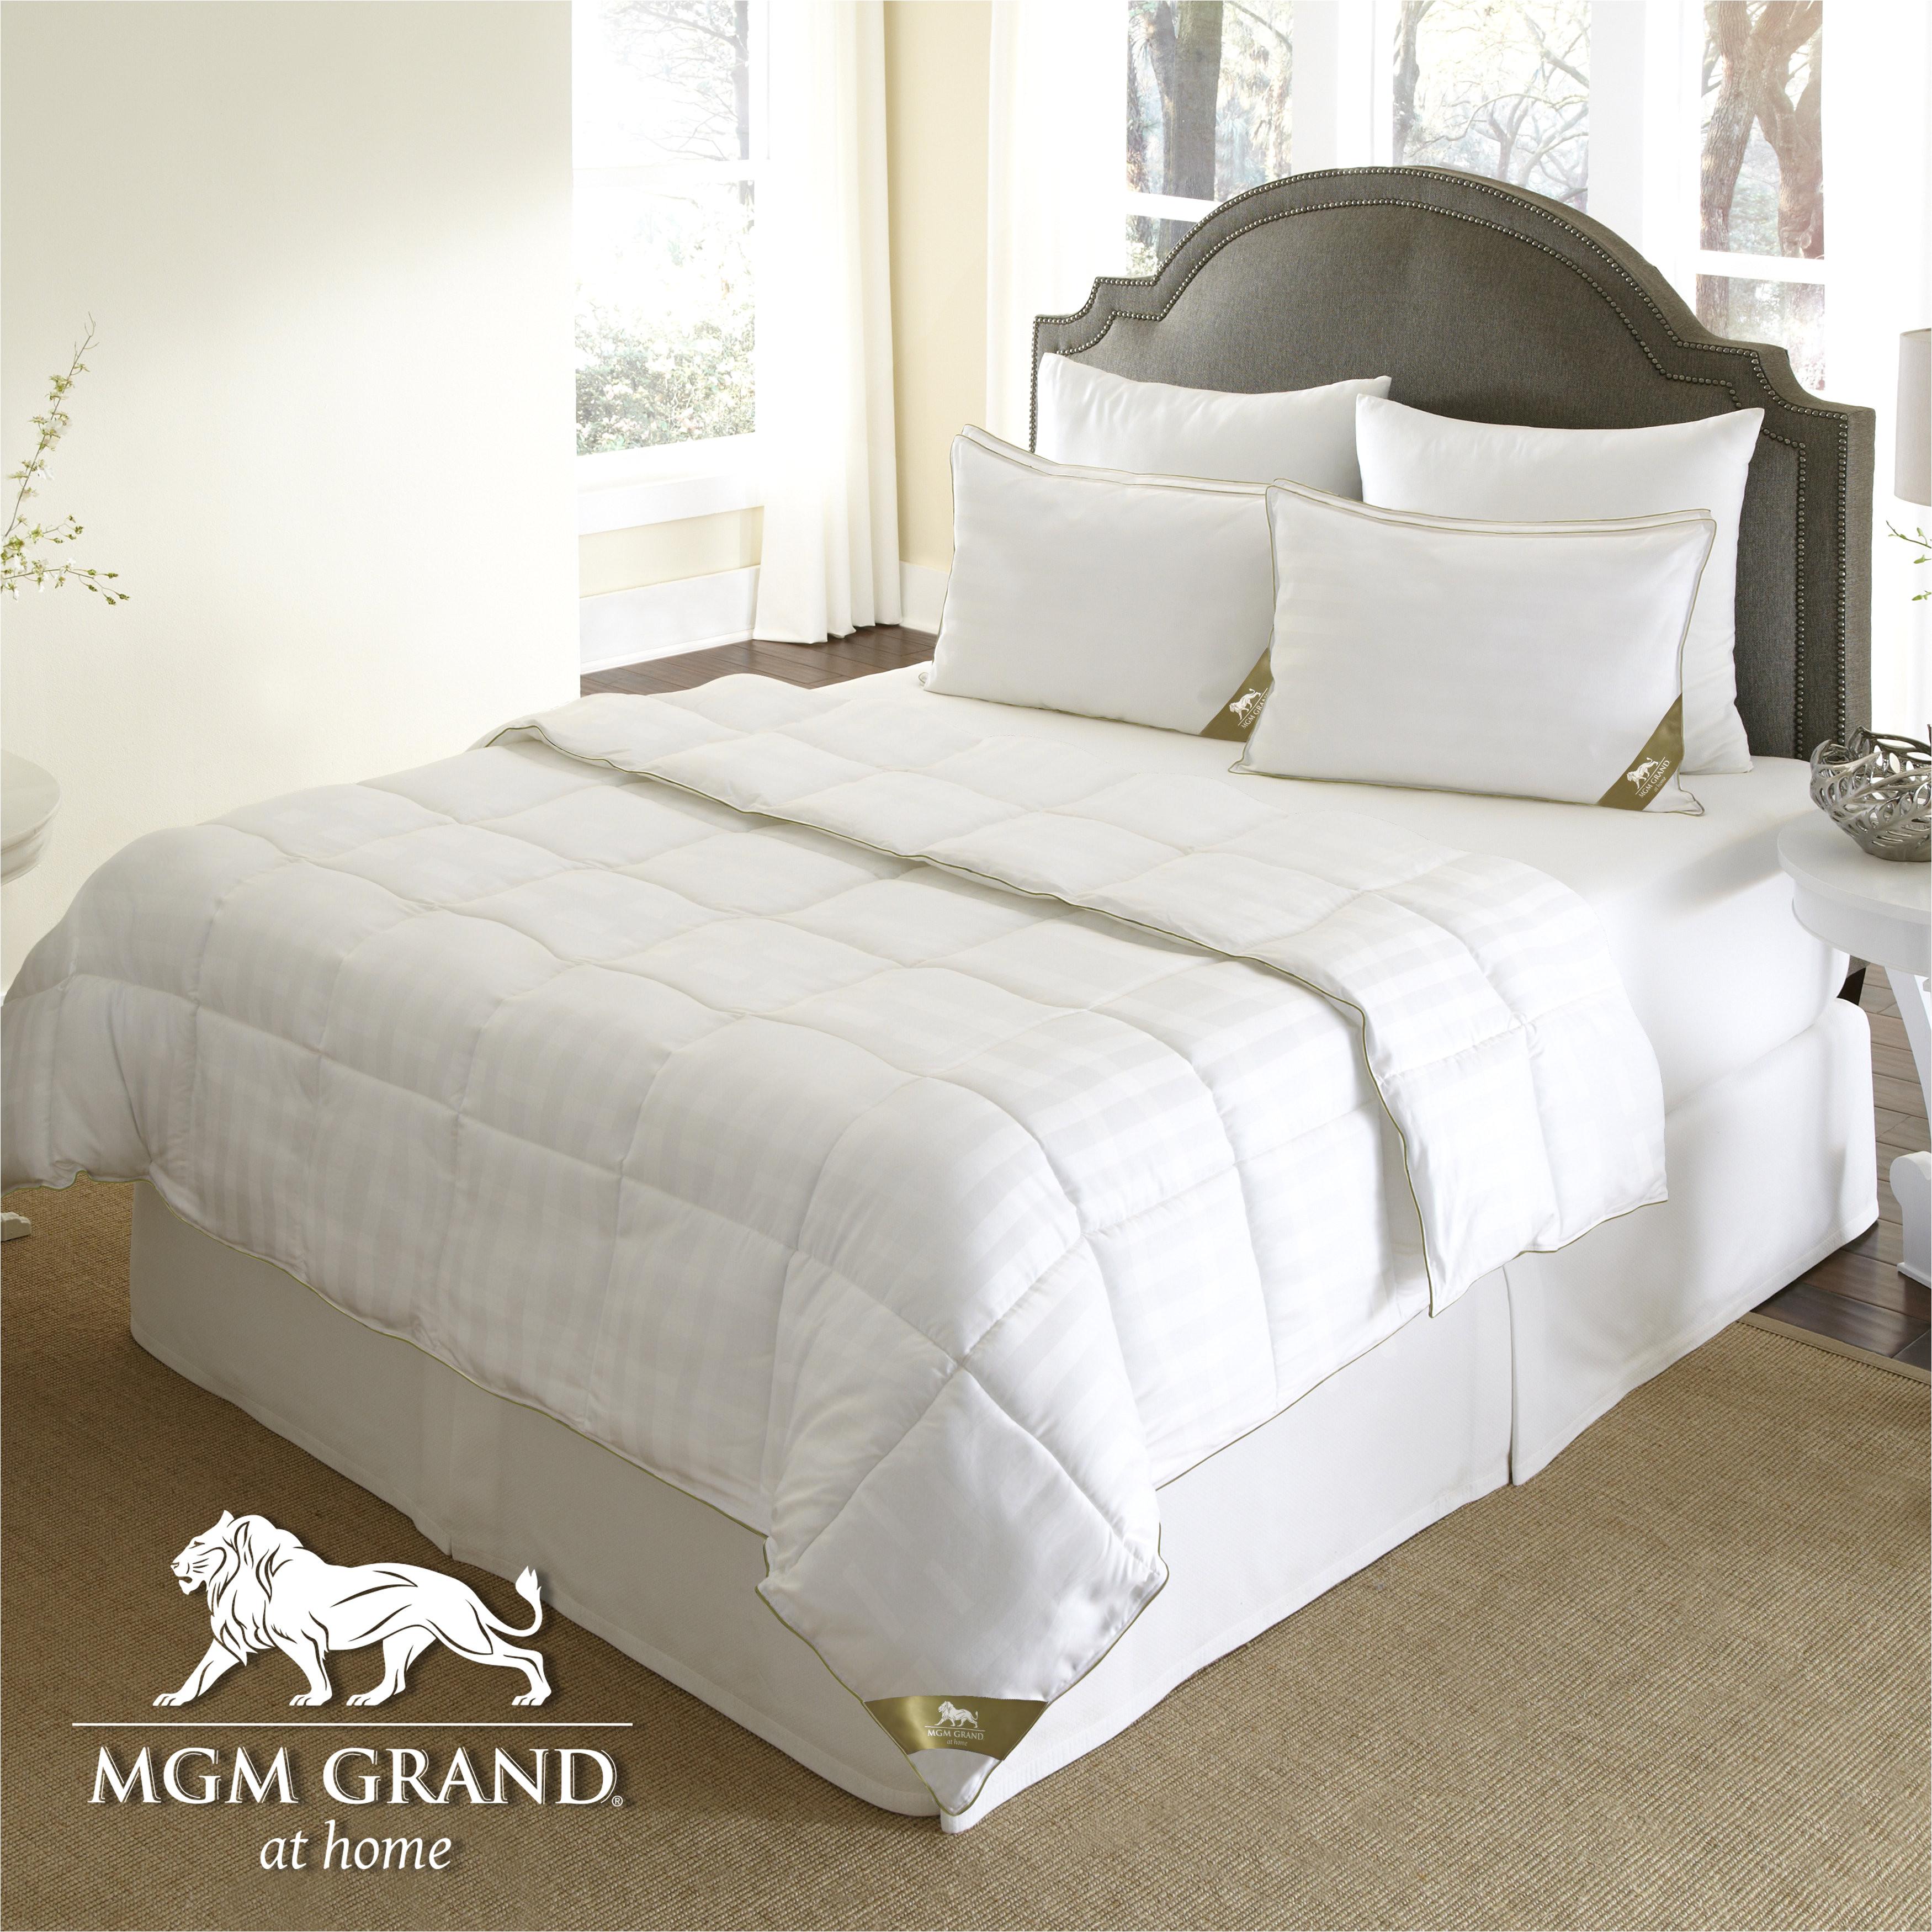 the ultimate winter comforter hotel luxury down alternative comforter duvet insert tabs washable hypoallergenic